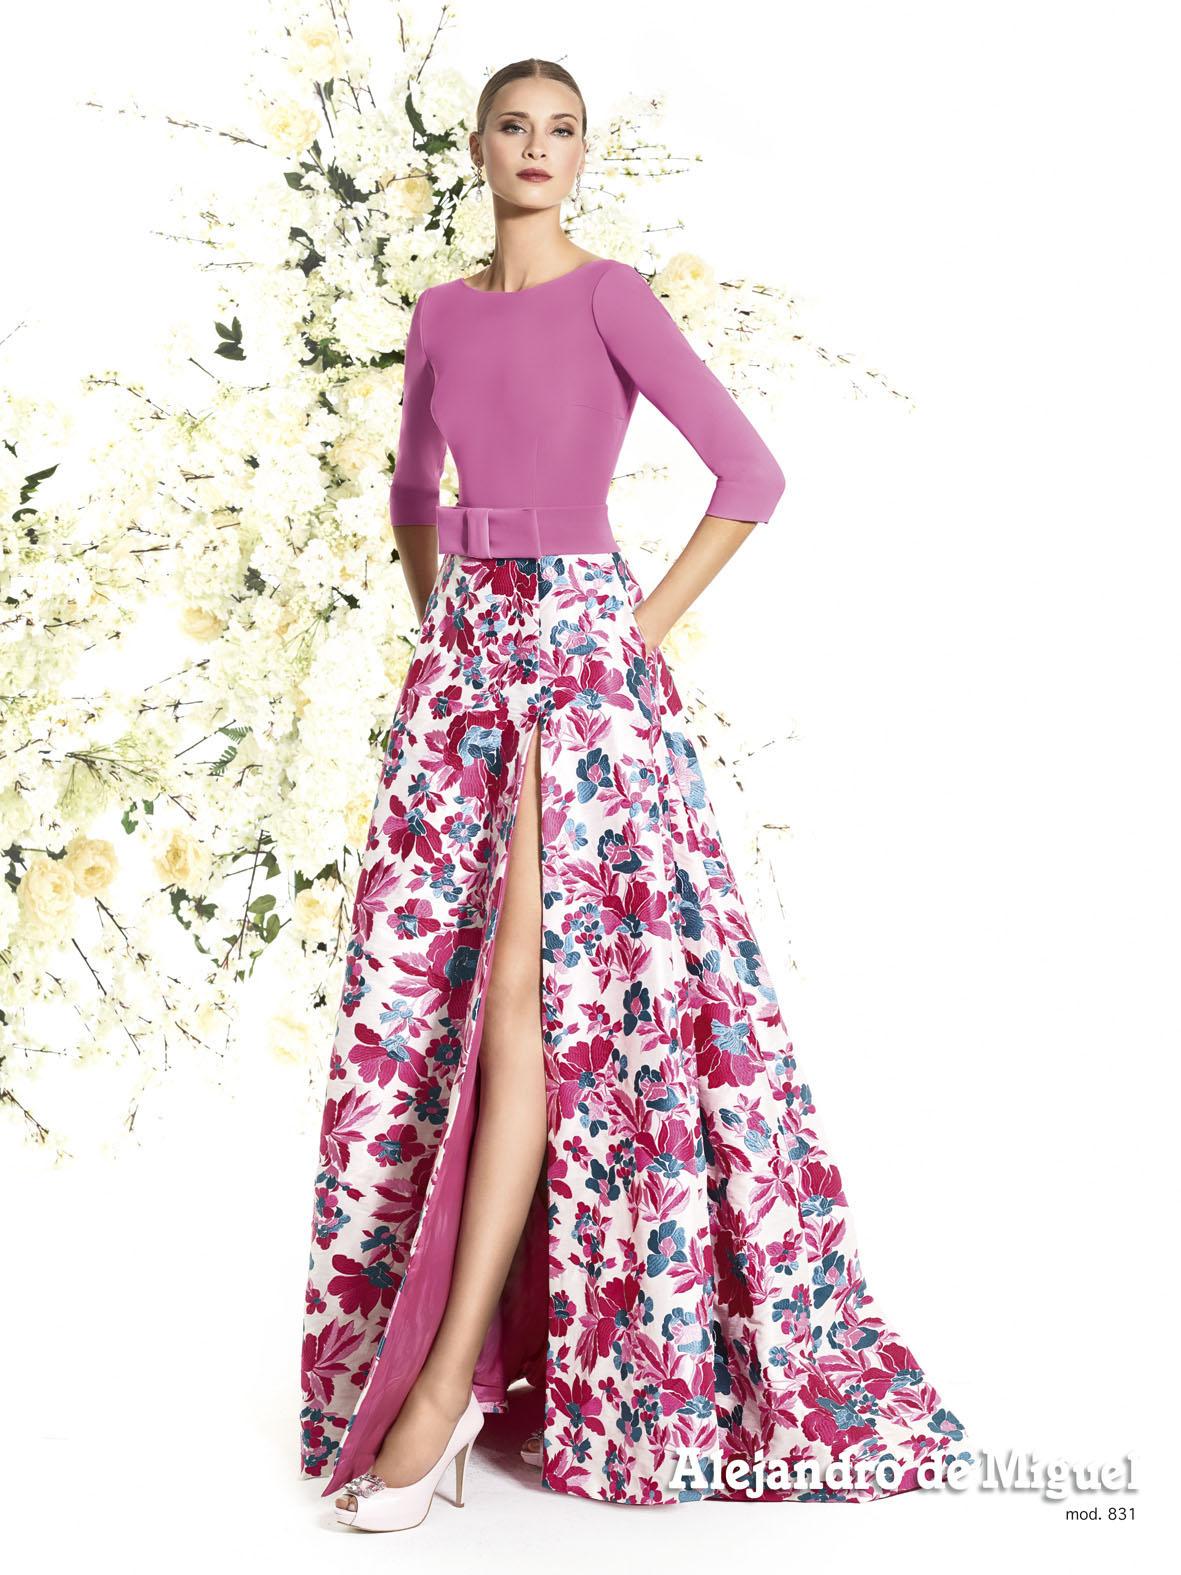 Vestido Largo - mod. 831